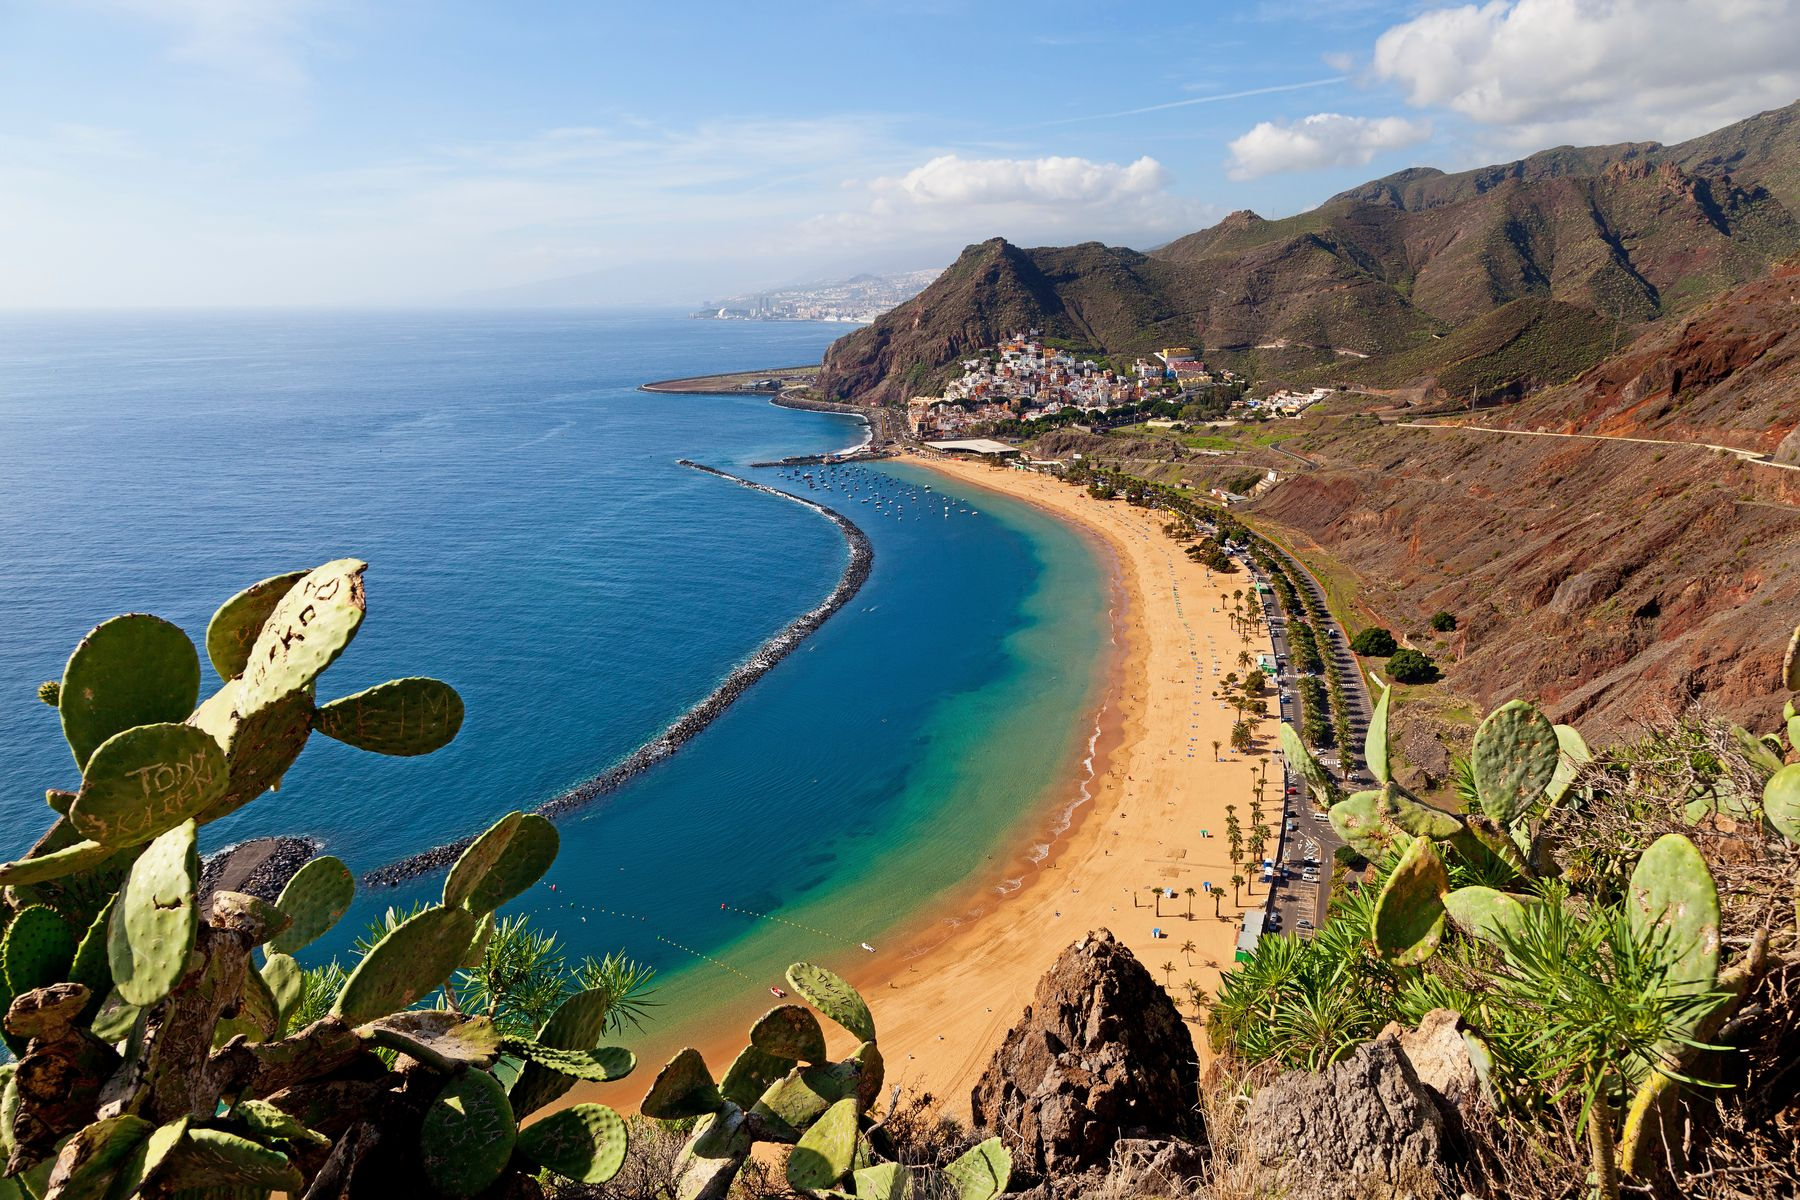 Playa de las Teresitas auf Teneriffa in Spanien